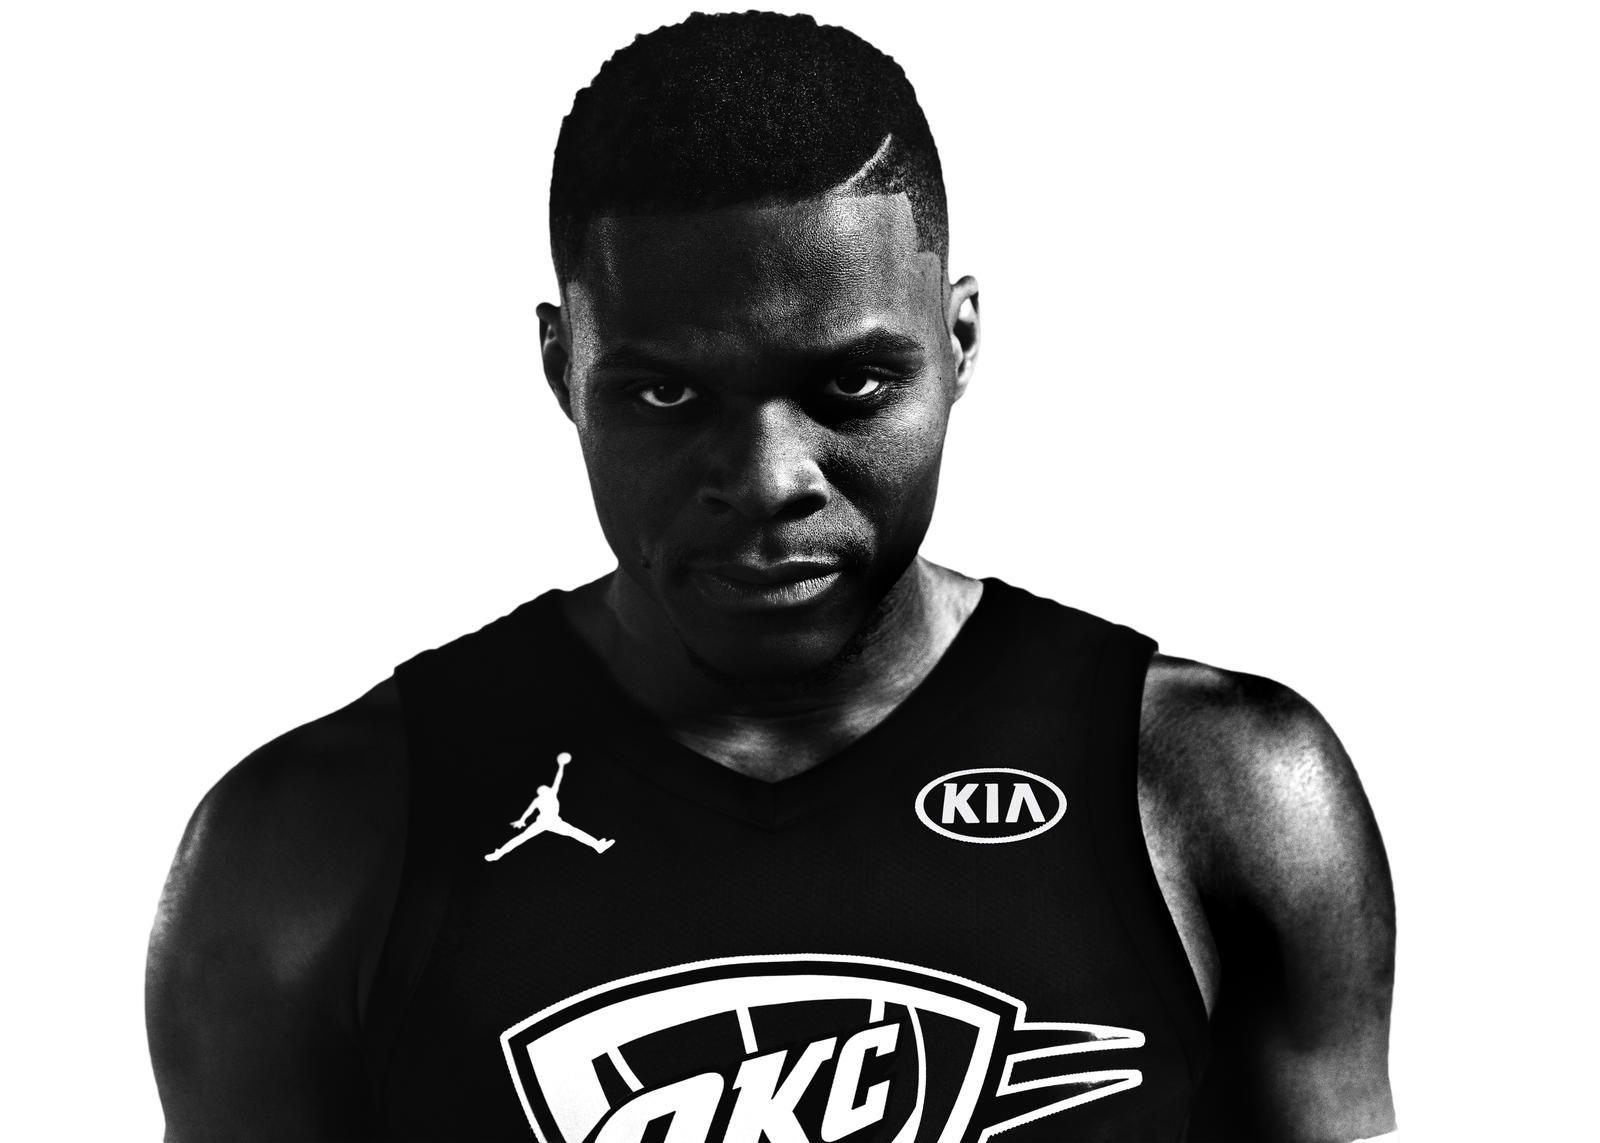 c0ca5ce63885 Here are the 2018 Jordan Brand NBA All-Star Edition Uniforms ...